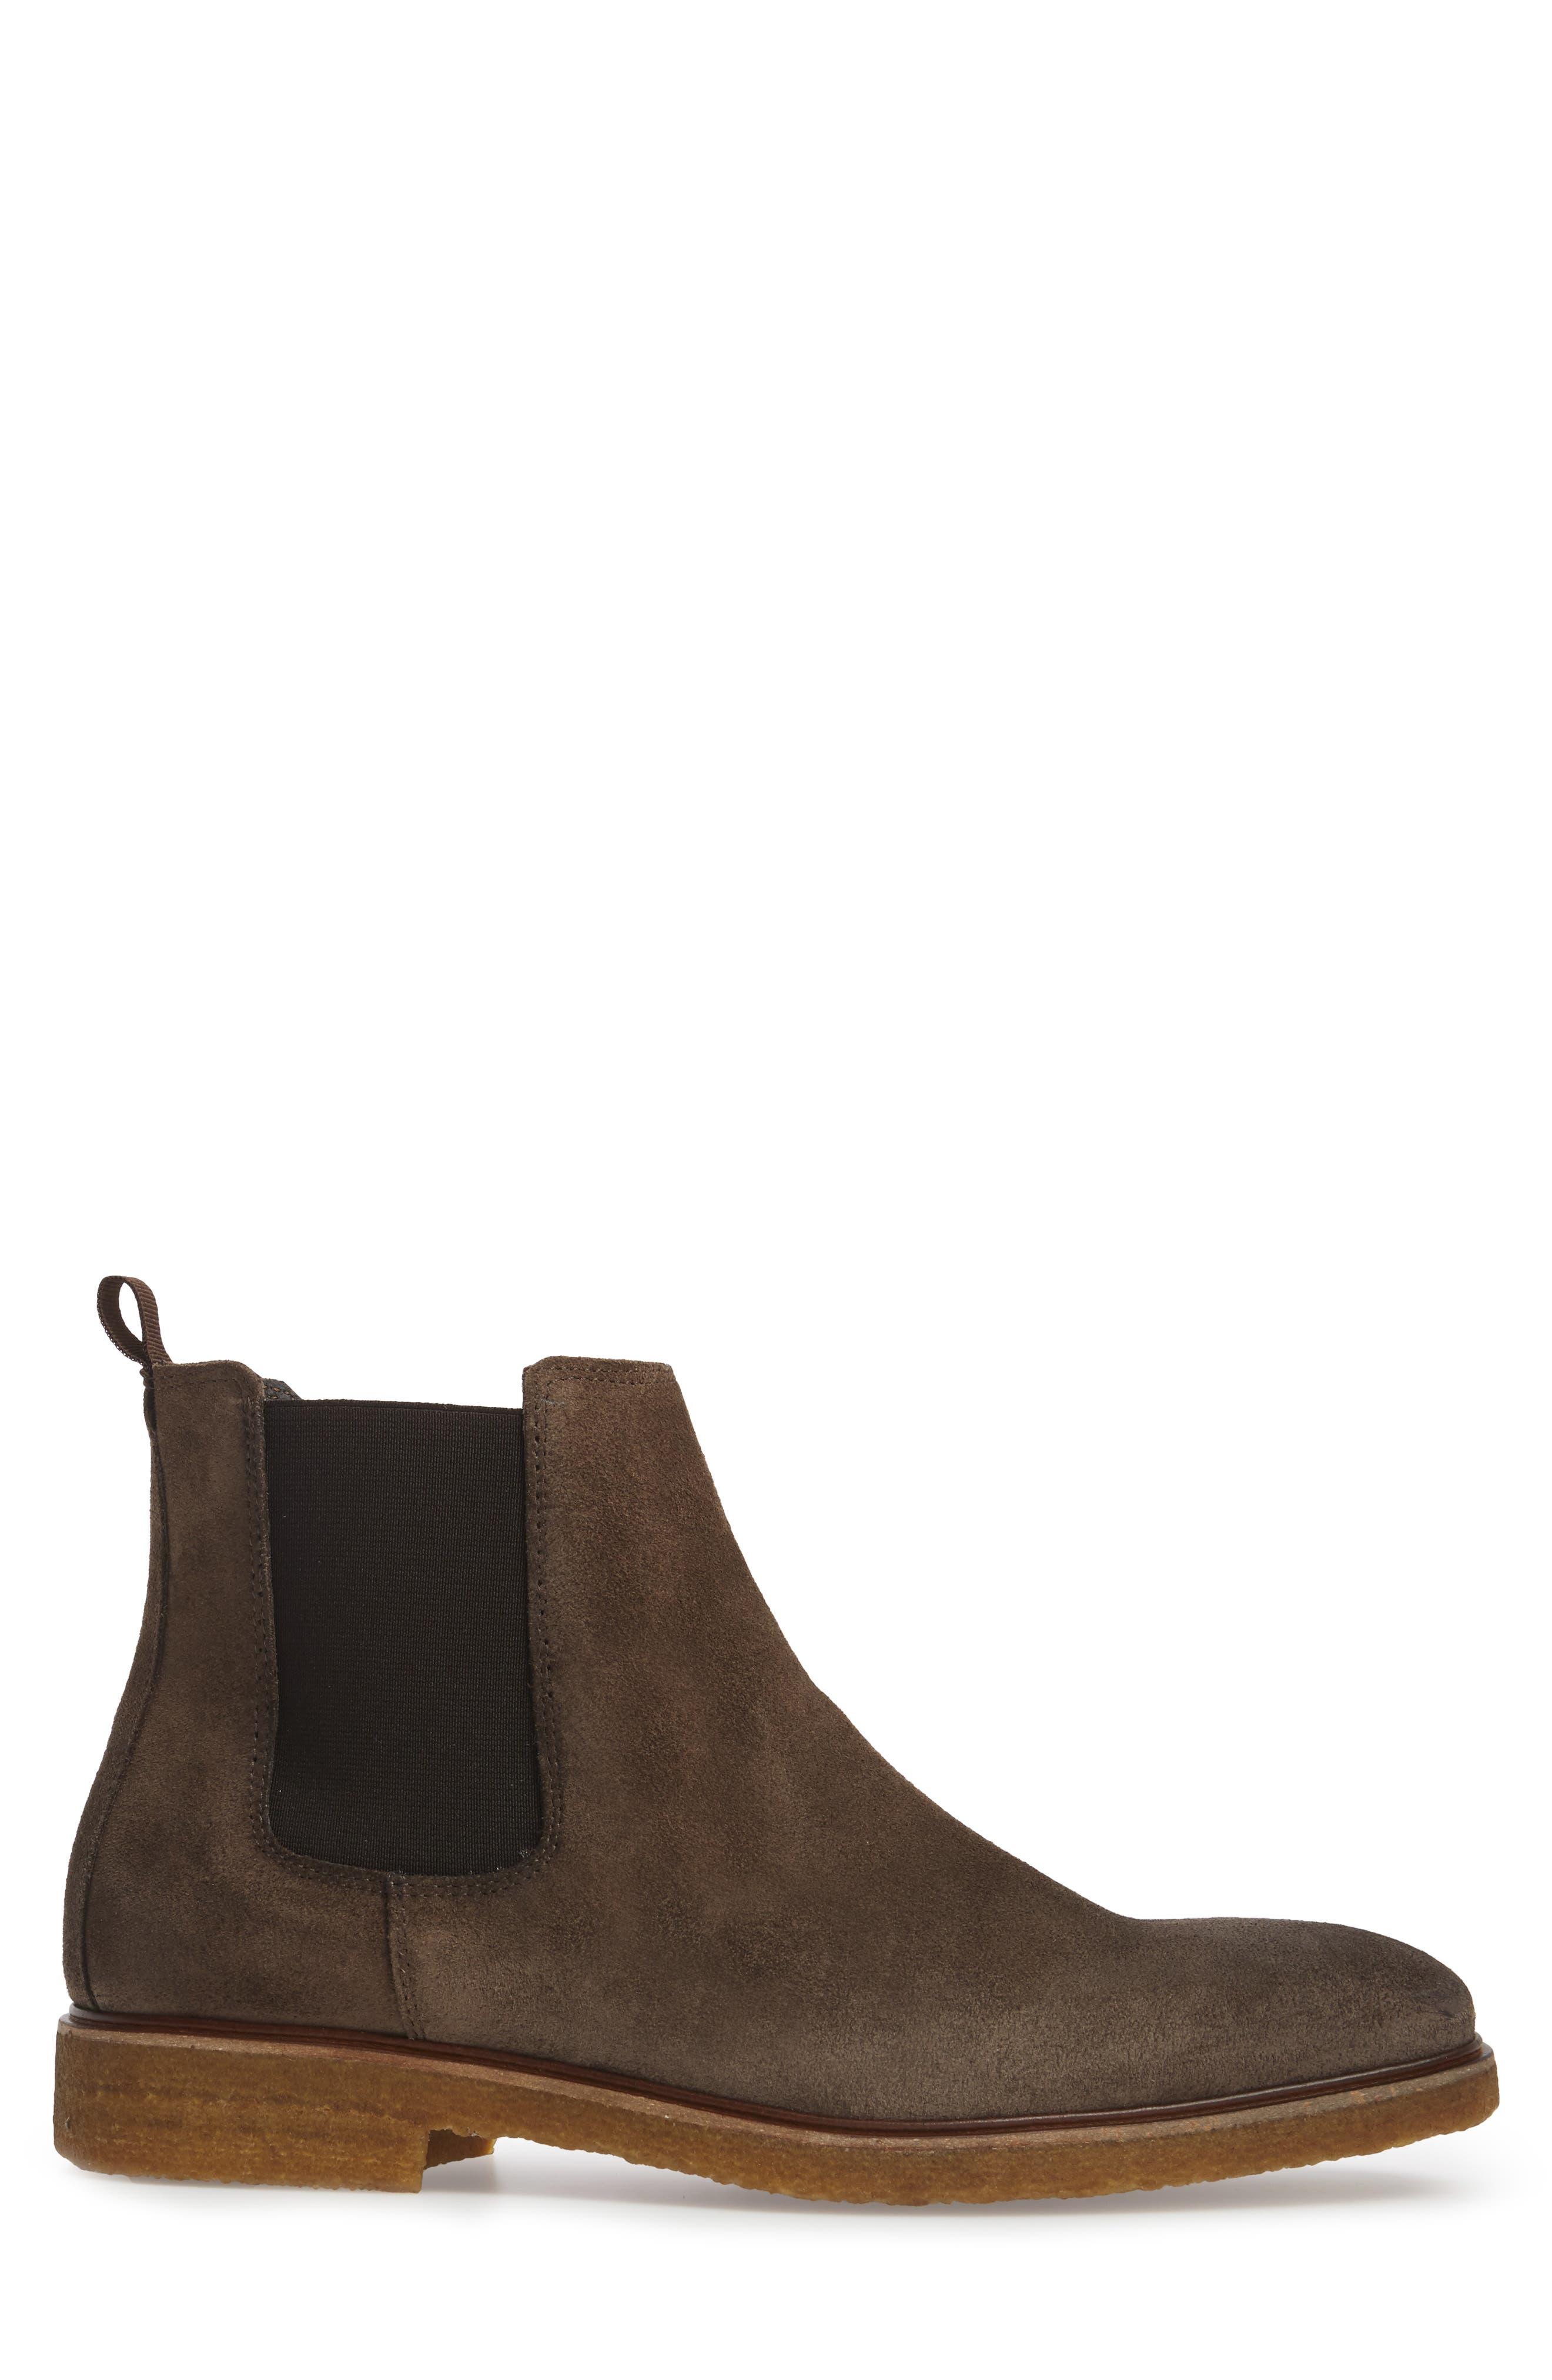 Sullivan Chelsea Boot,                             Alternate thumbnail 3, color,                             023